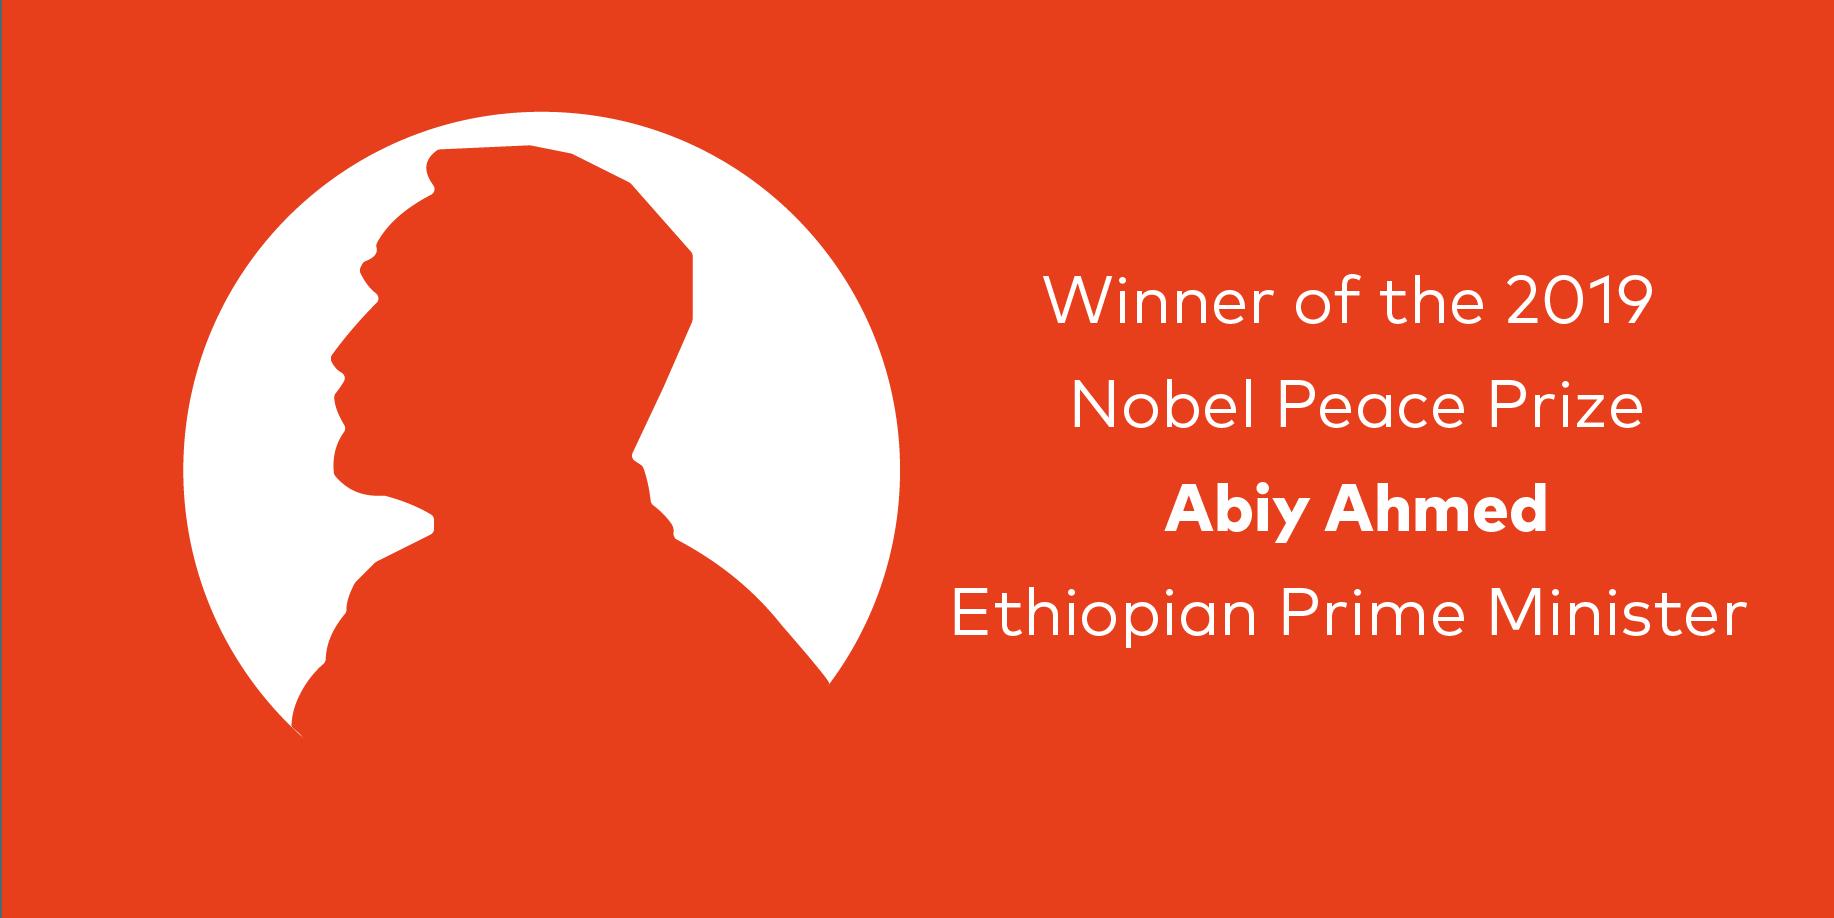 Nobel Peace Prize 2019 African European